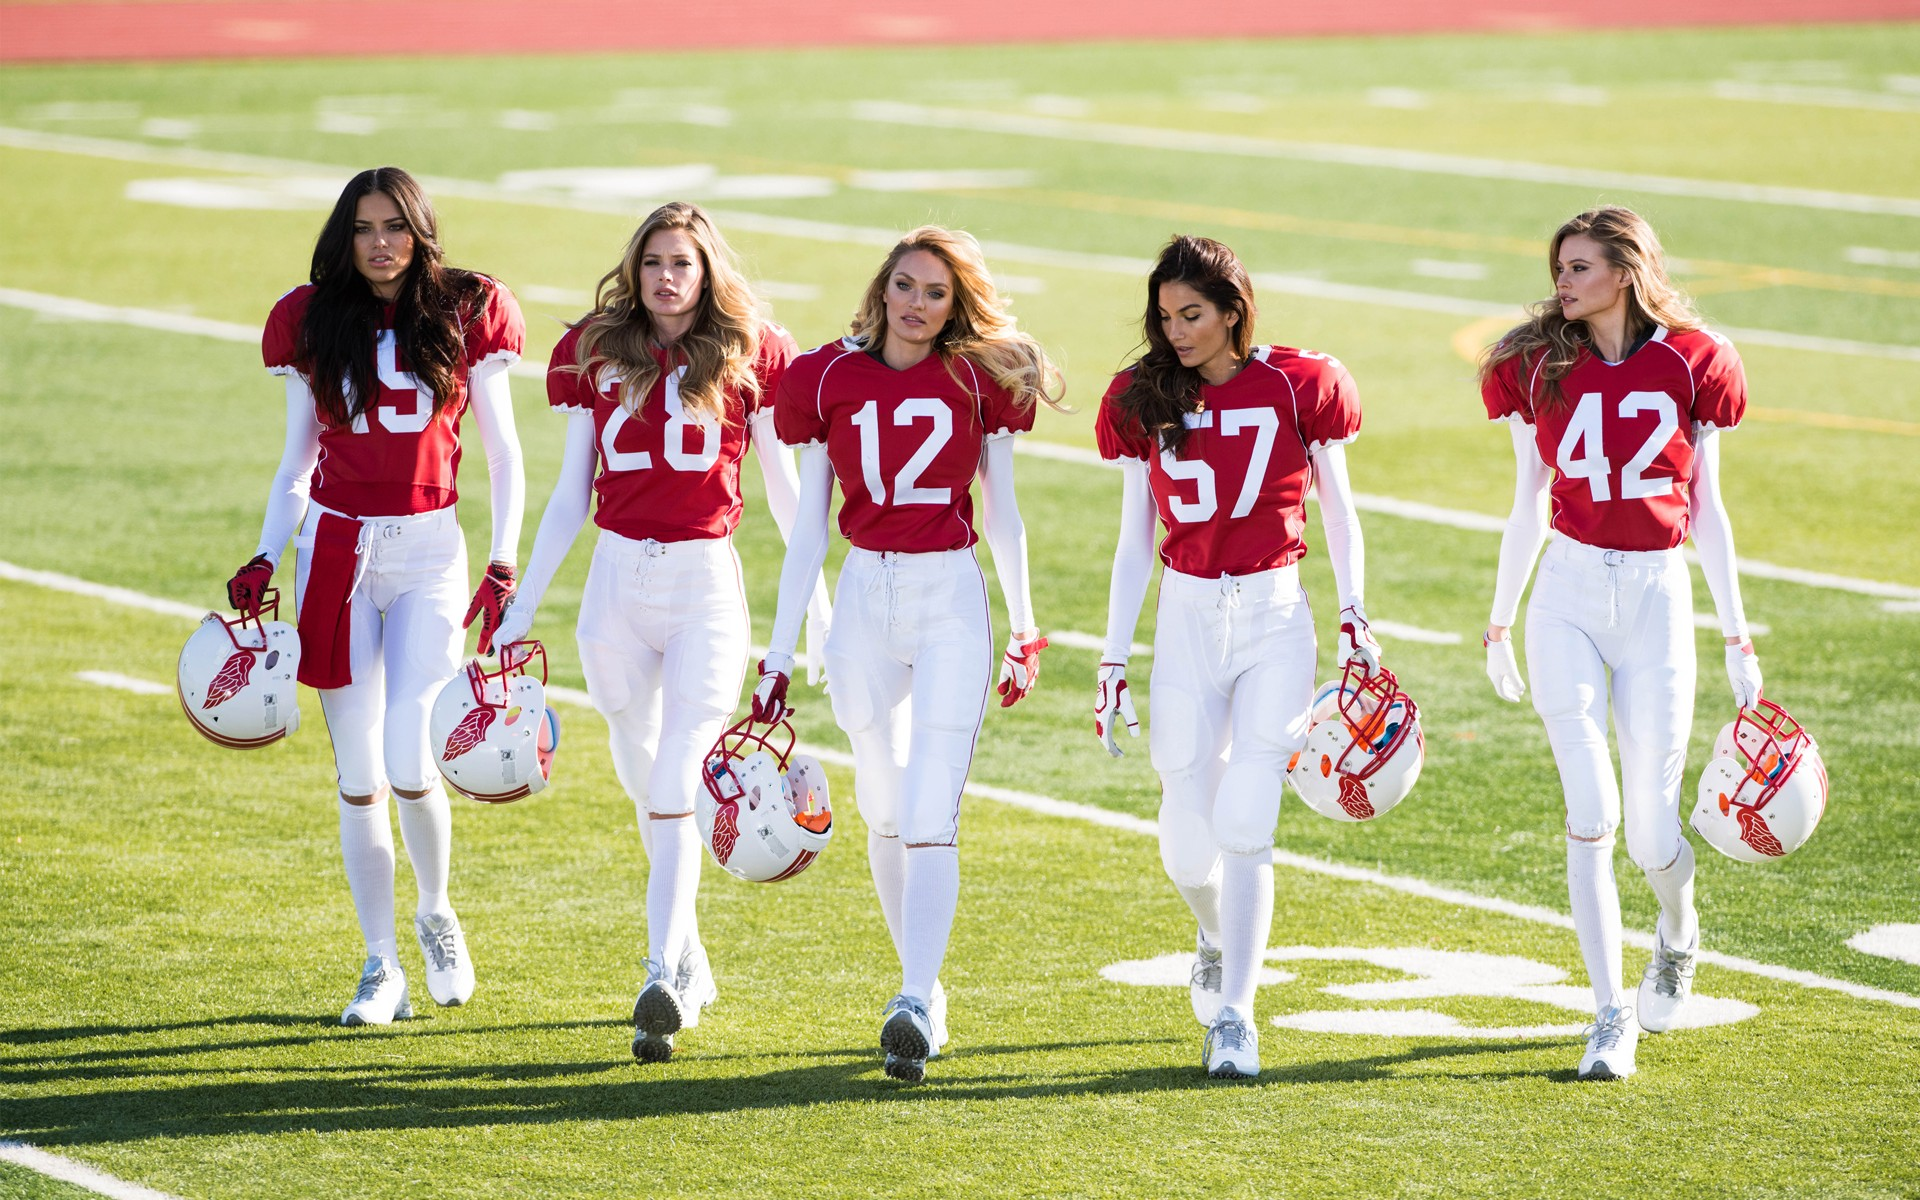 People 1920x1200 women model numbers American football Victoria's Secret